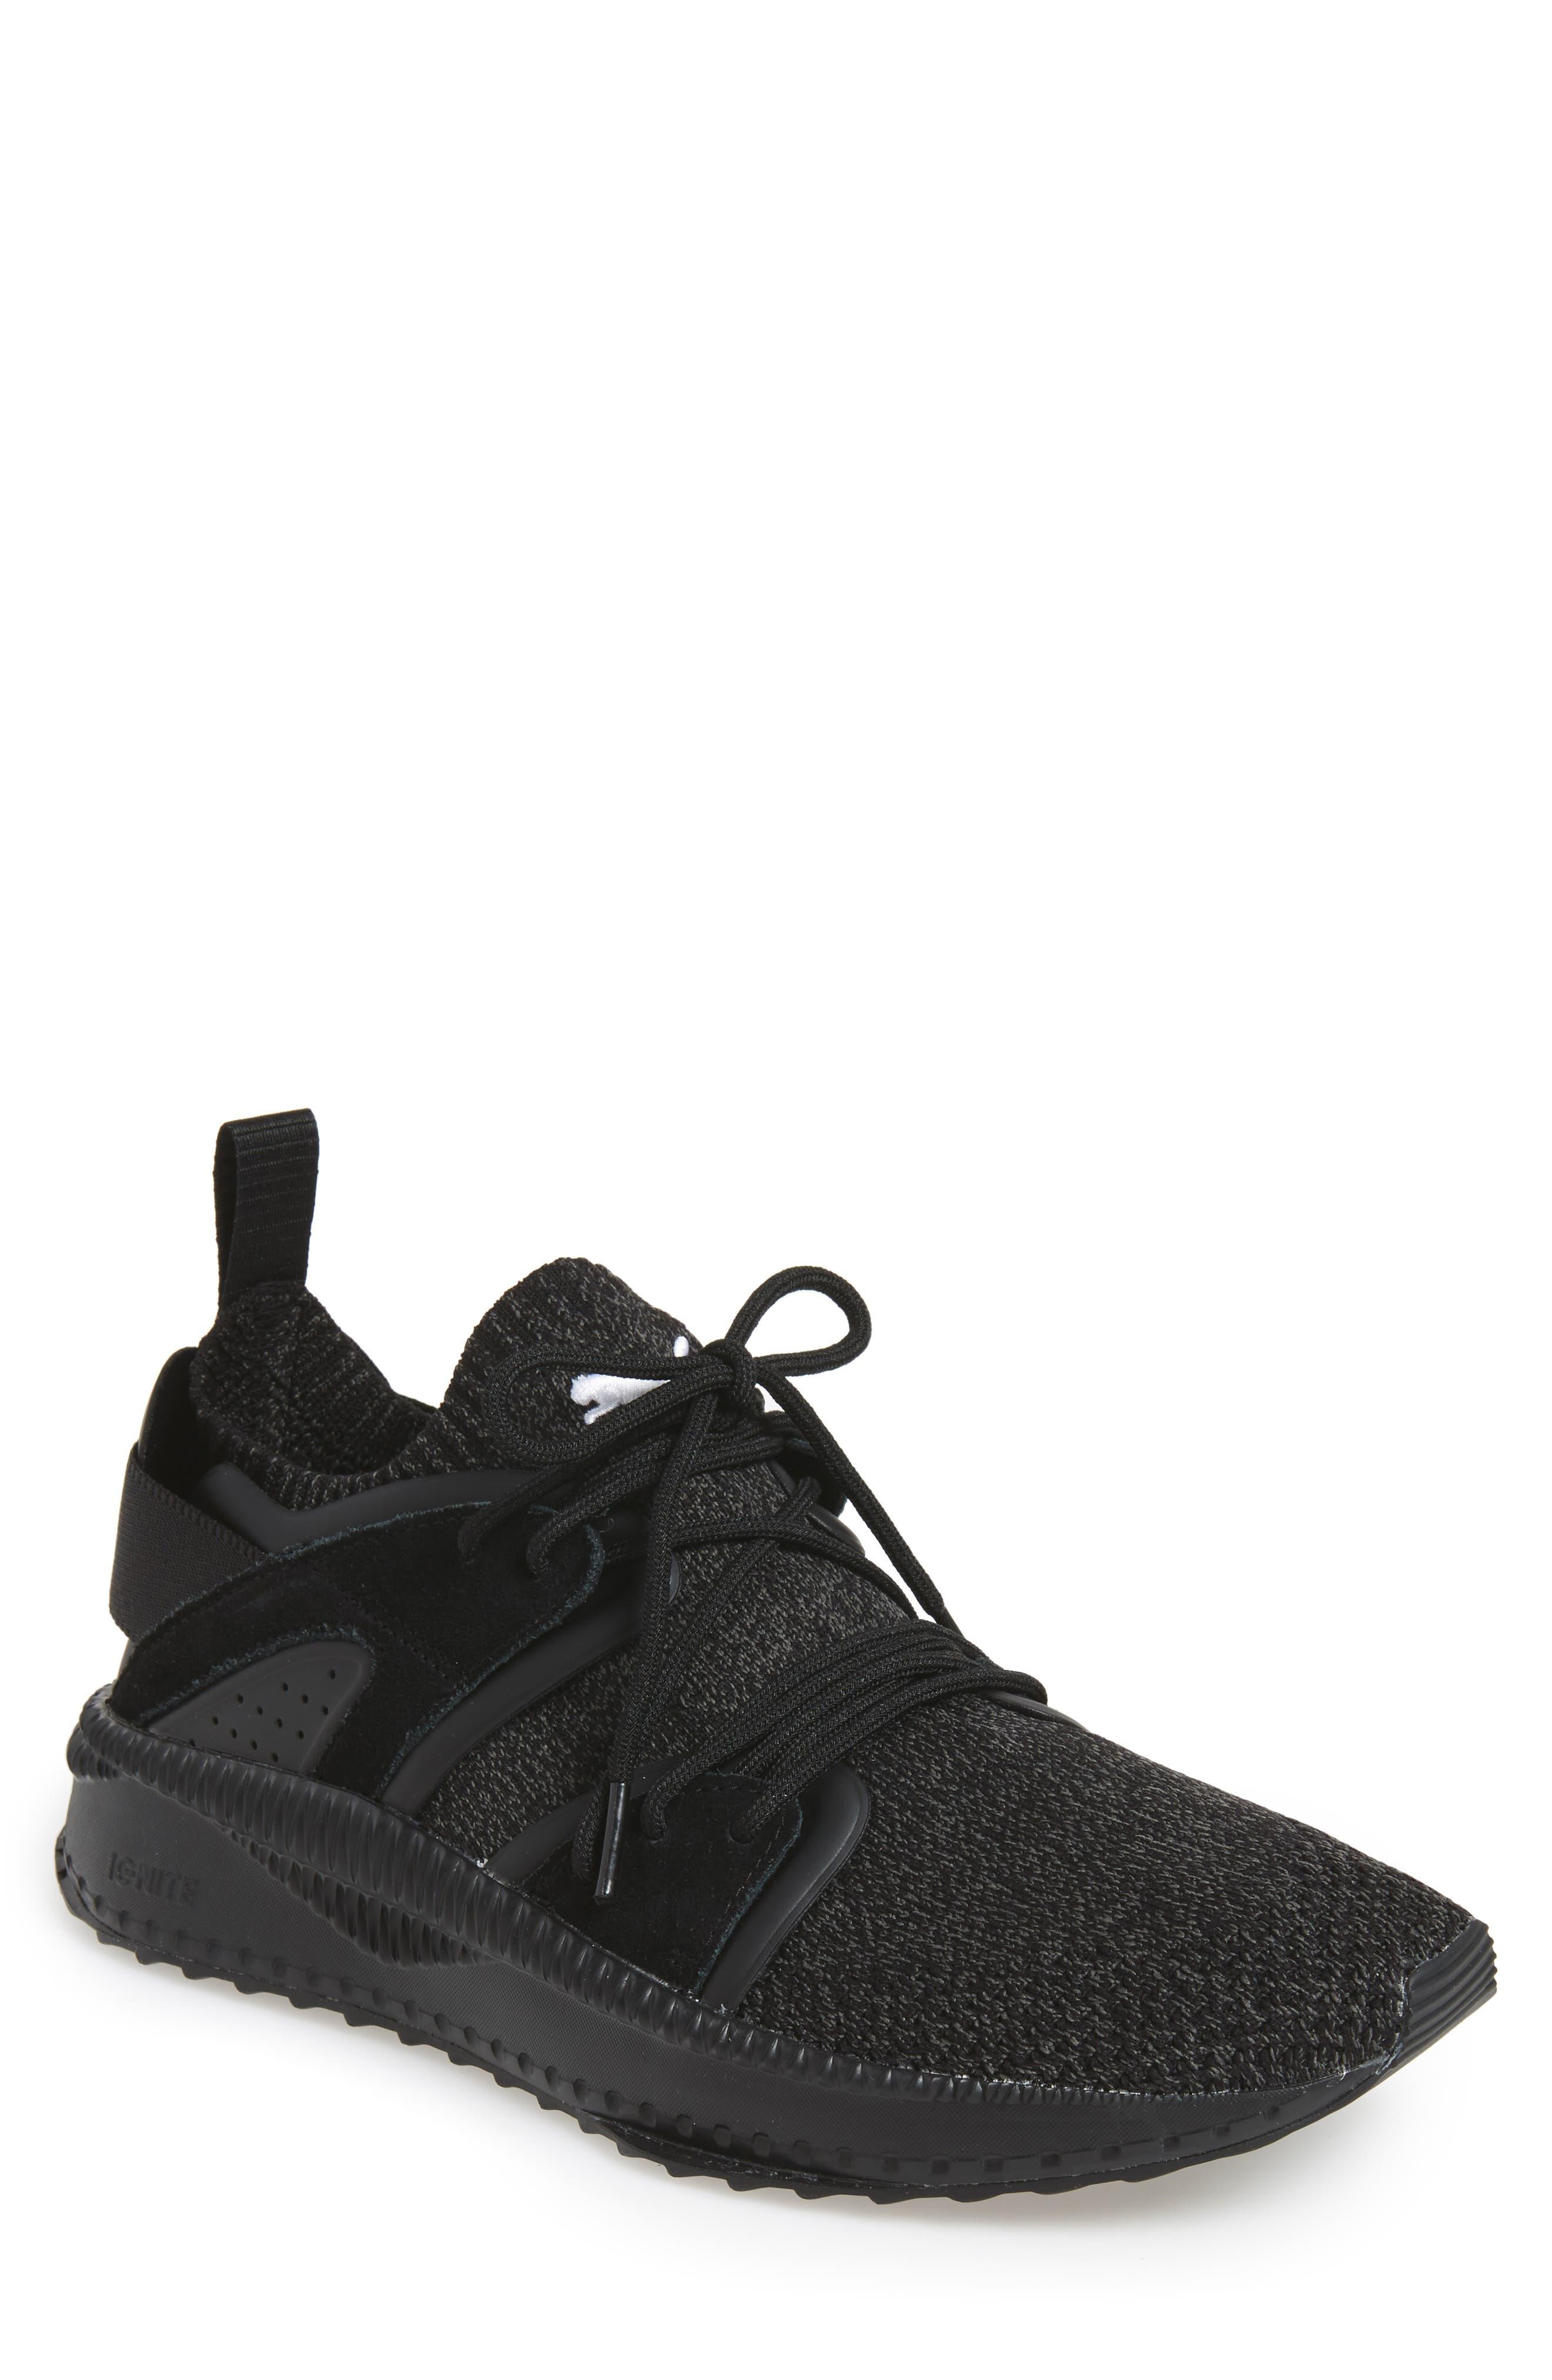 Tsugi Blaze EvoKnit Sneaker,                             Main thumbnail 1, color,                             001